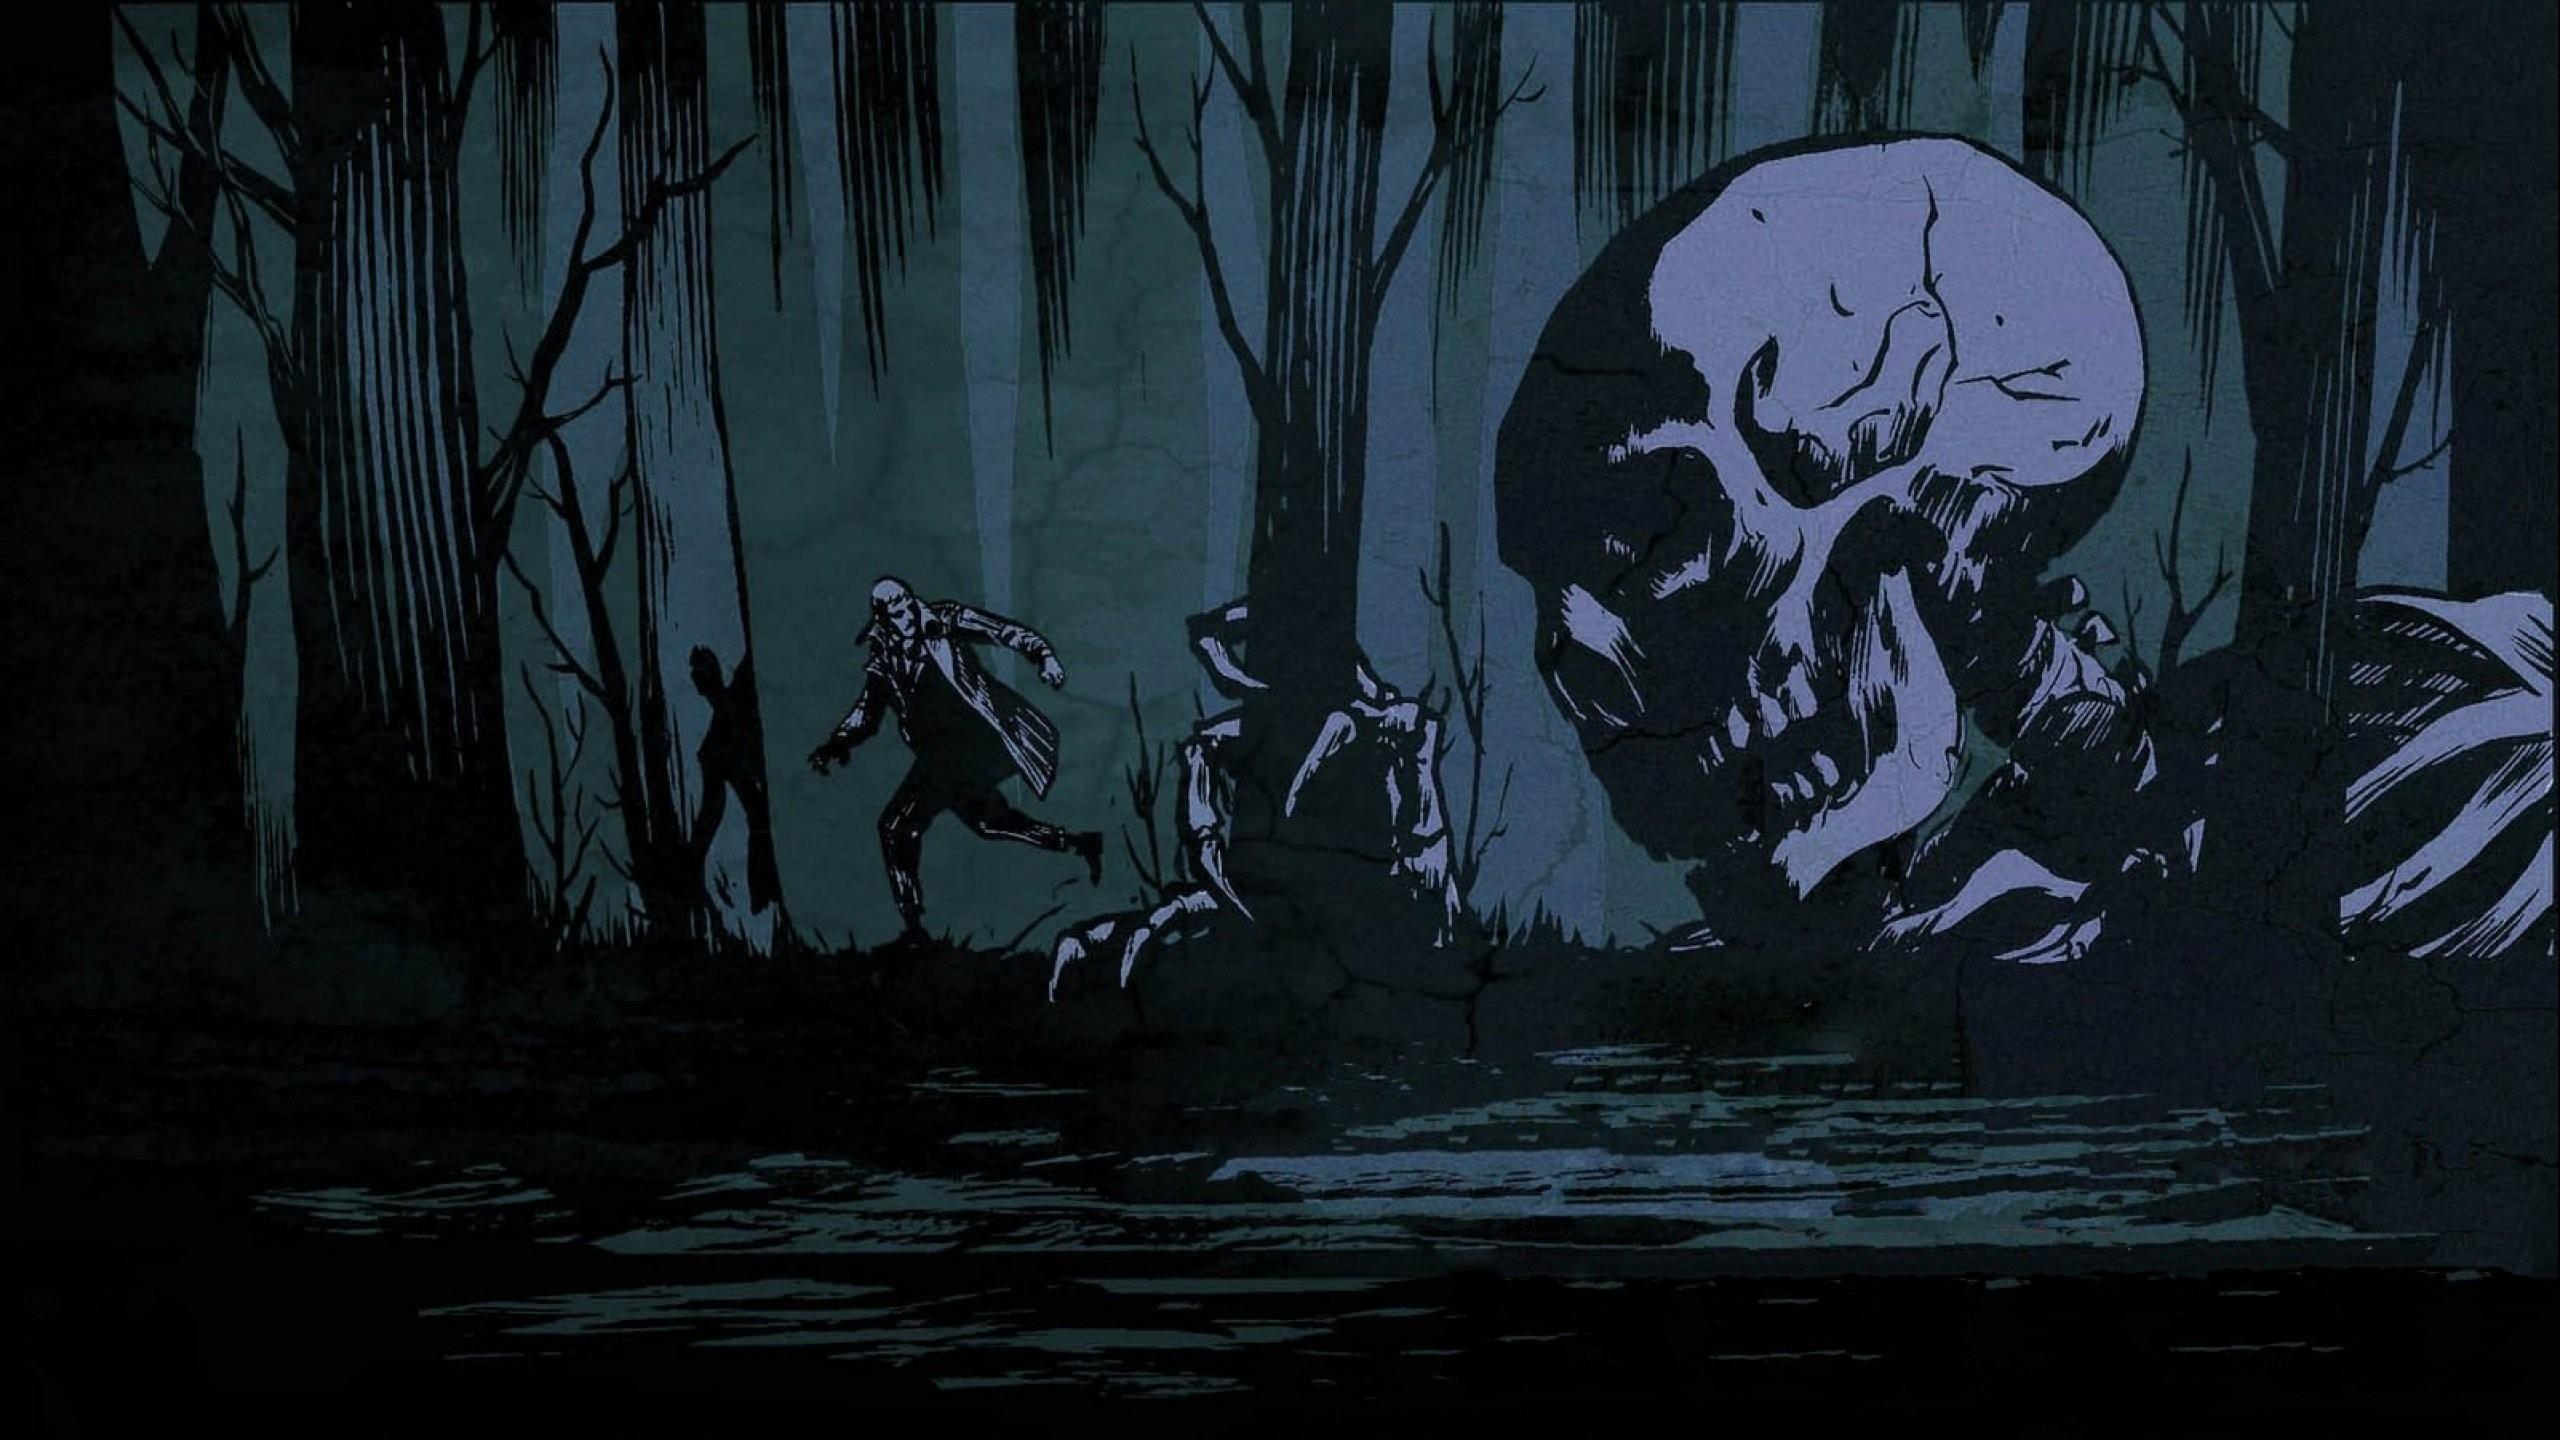 Dark Evil Wallpapers (63+ images)